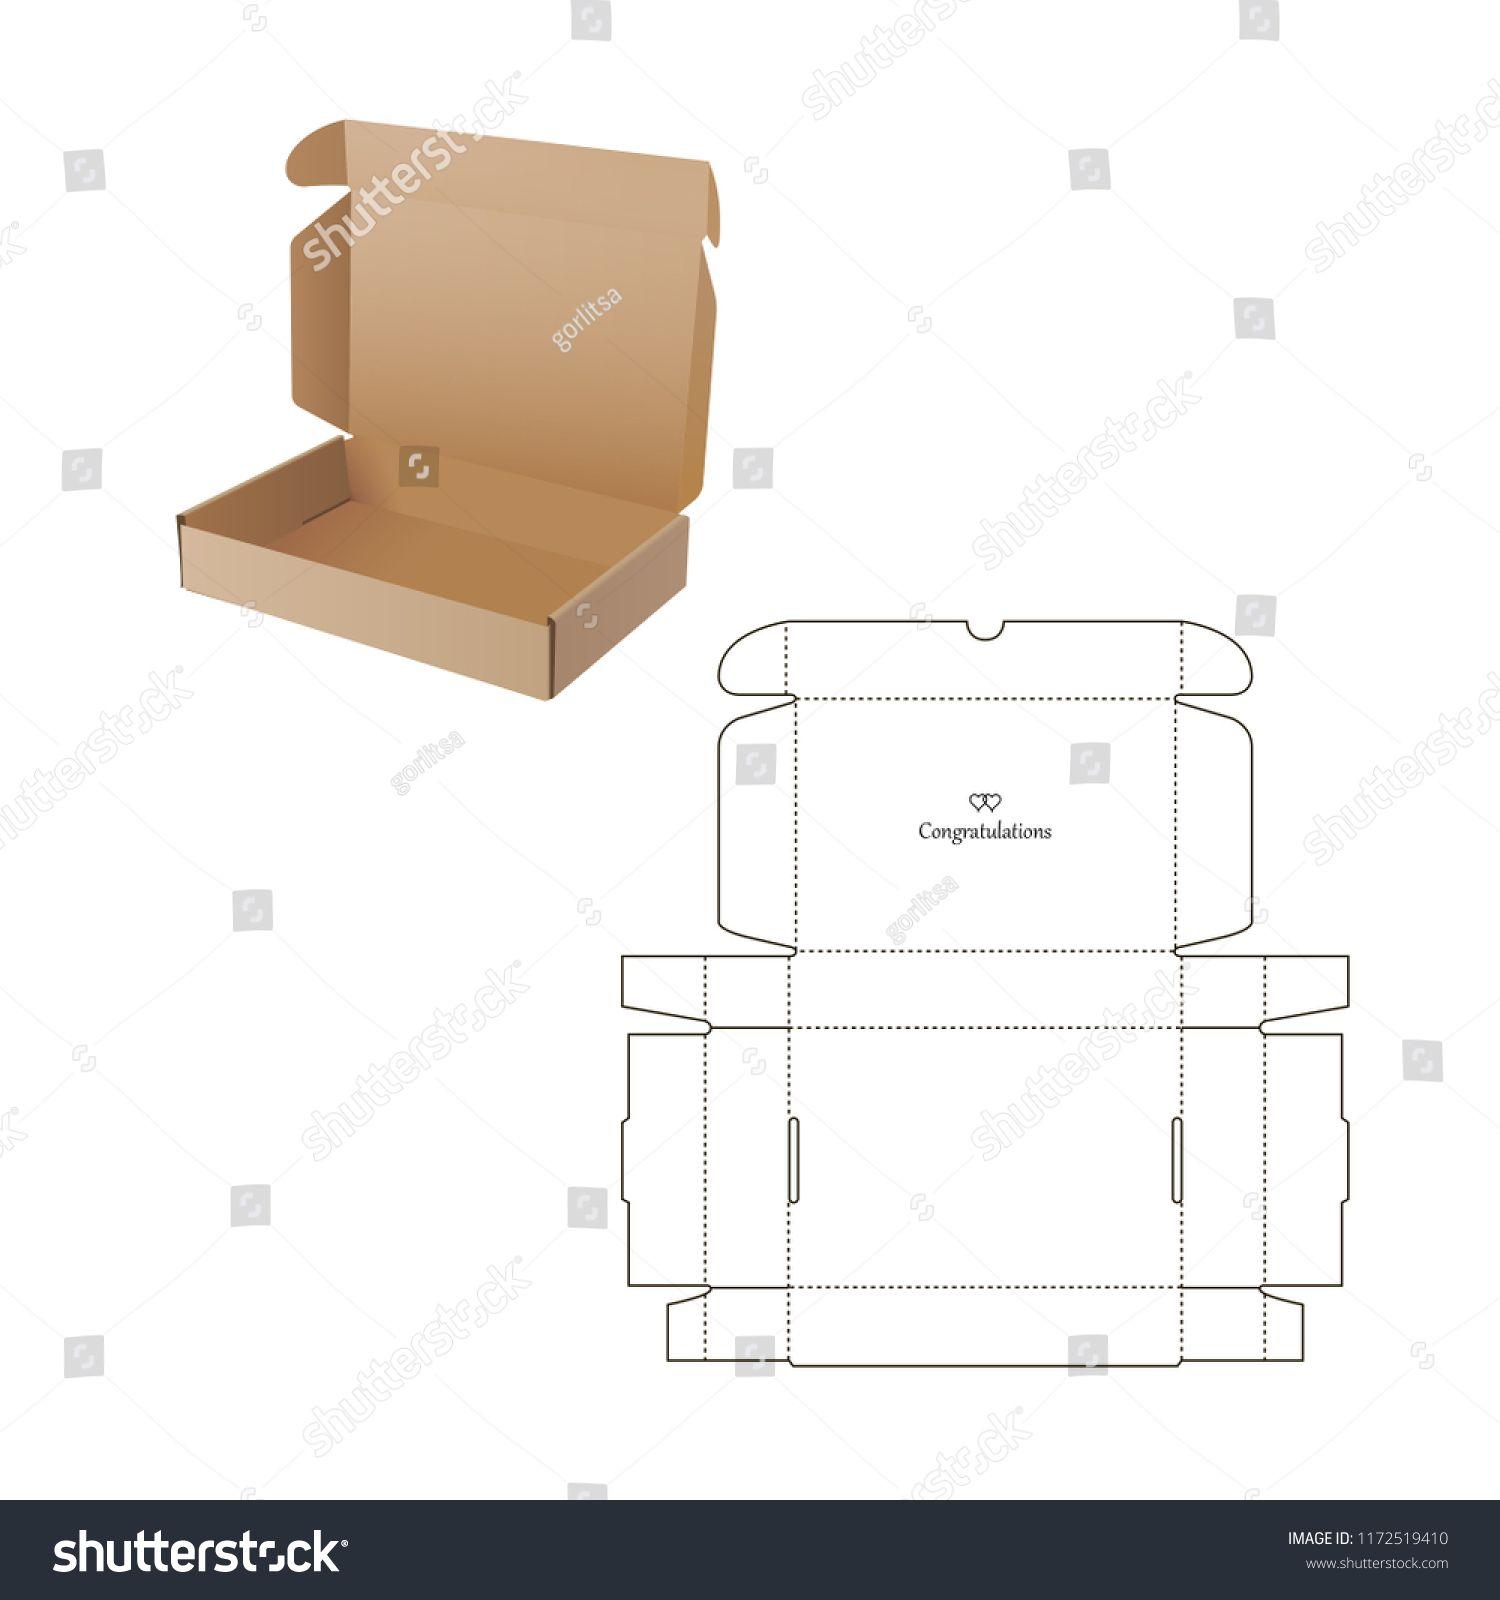 Retail Box Blueprint Template Royalty Free Stock Image Diy Gift Box Template Packaging Diy Box Paper Box Template